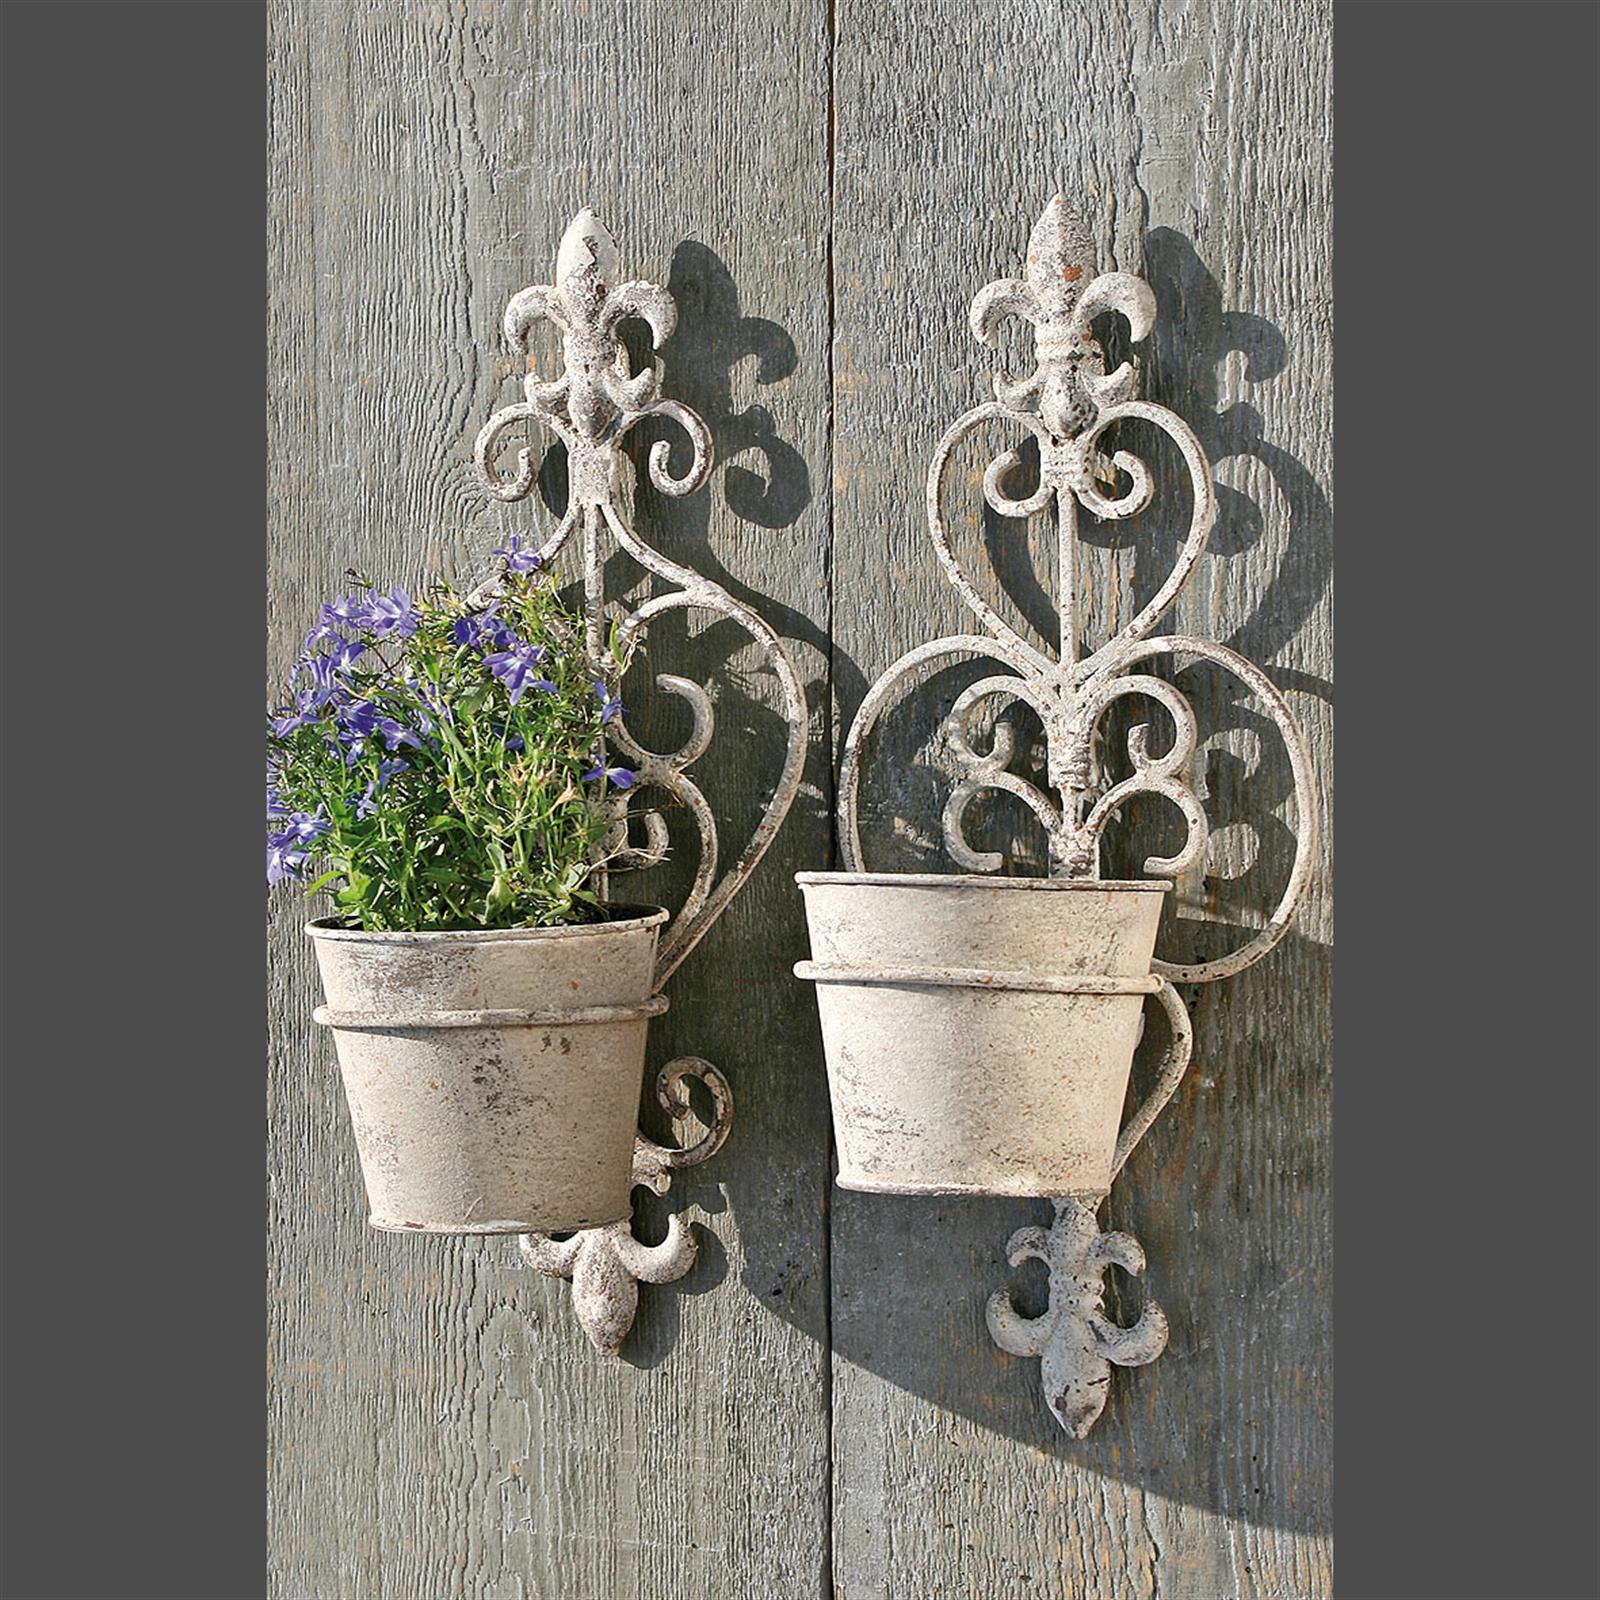 Image Is Loading 2 Wall Mount Flower Pots Grey 13 5